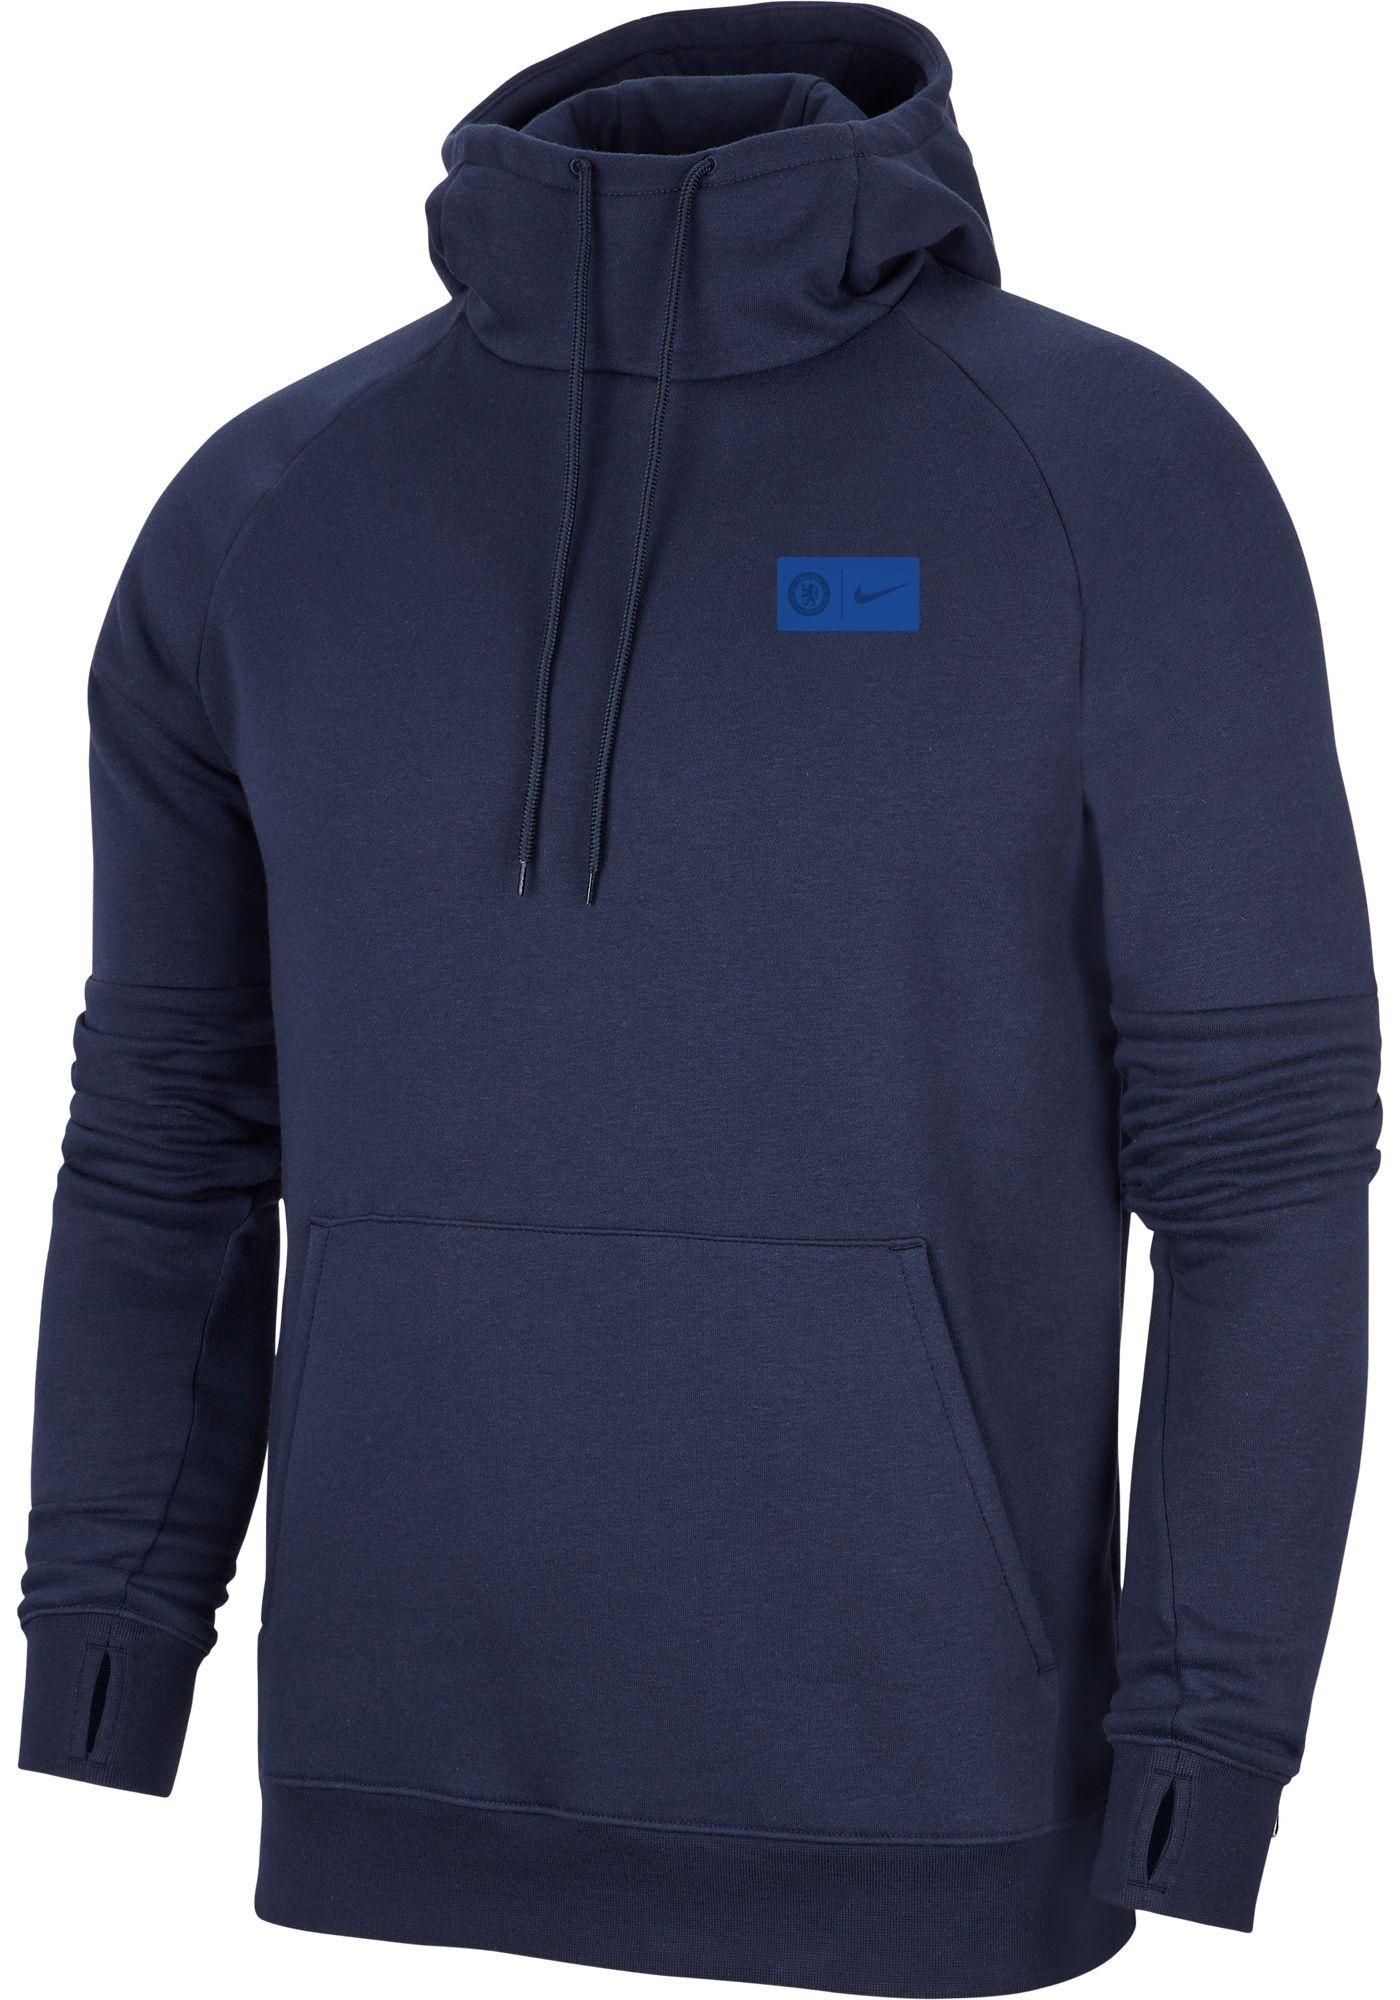 Nike Men's Chelsea FC Fleece Navy Pullover Hoodie